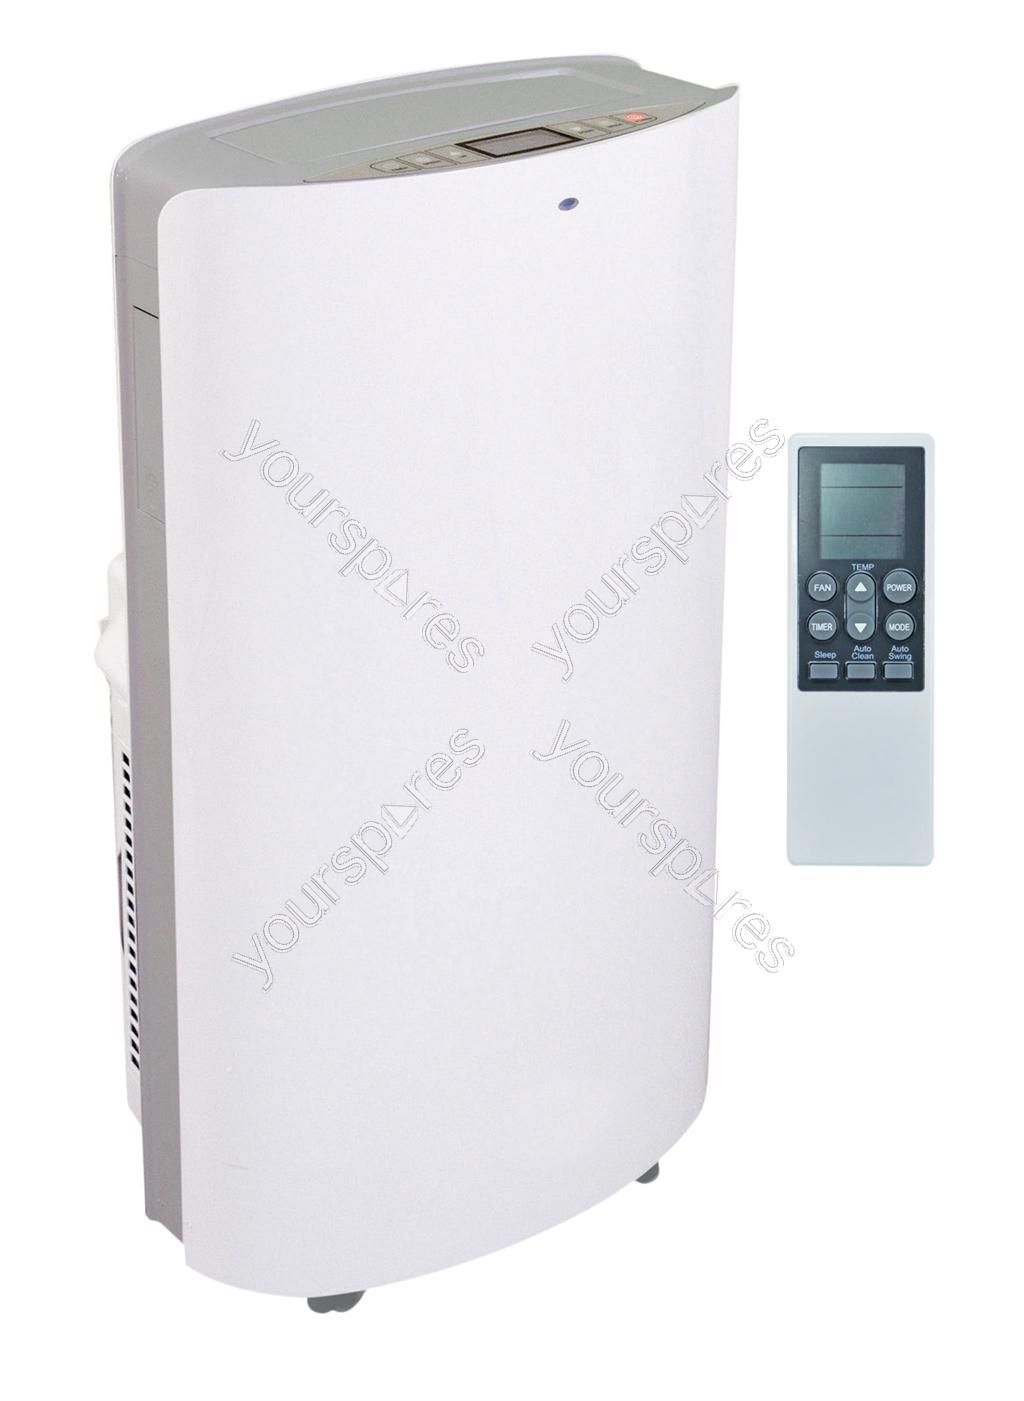 12000 Btu Per Hour Mobile Portable Air Conditioner With